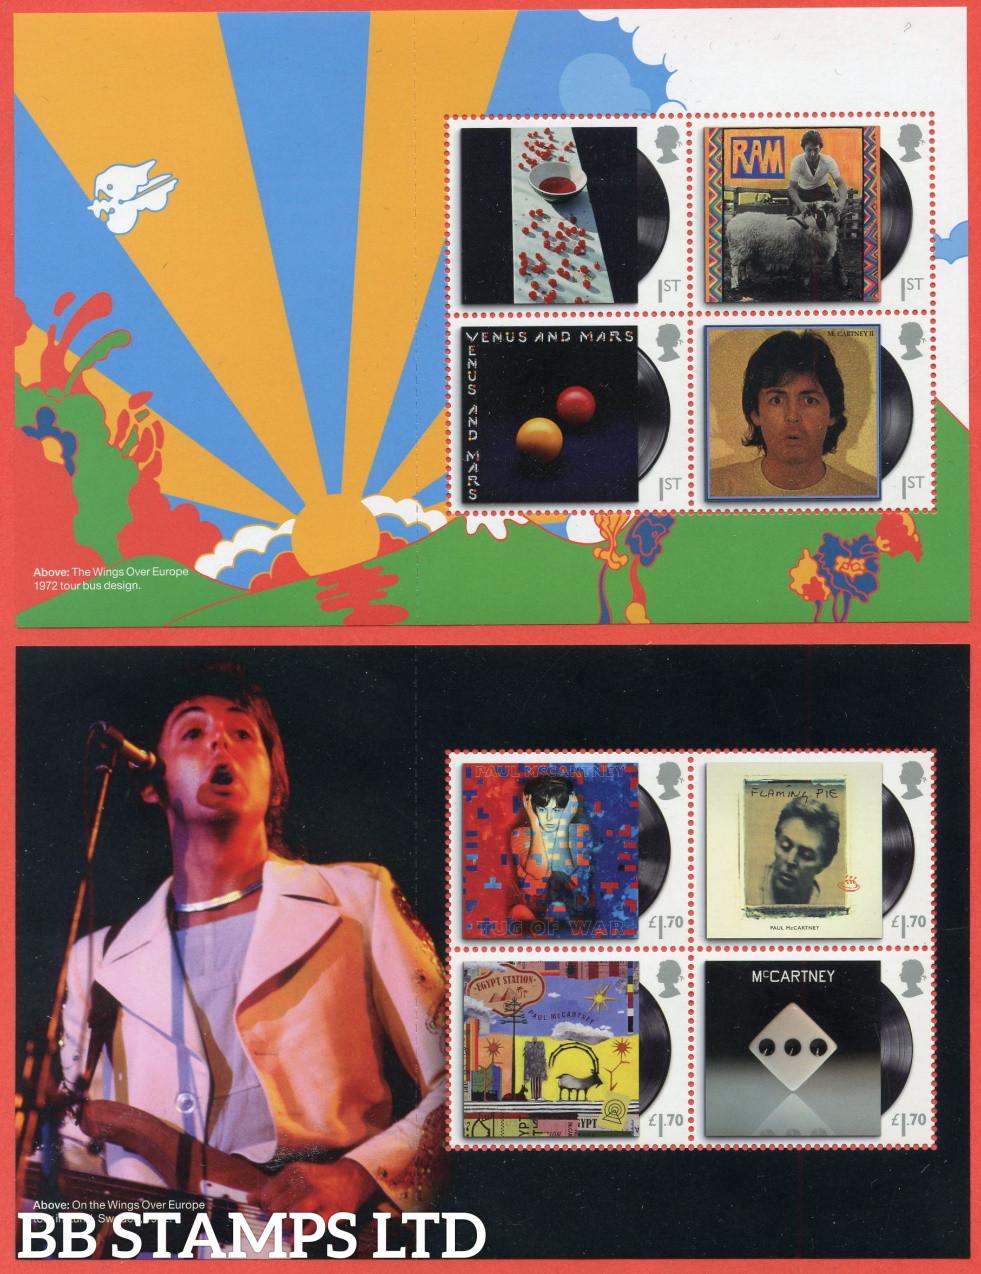 2021 Paul McCartney (Pane 1&2) ( 2nd issue?) (28.05.21)